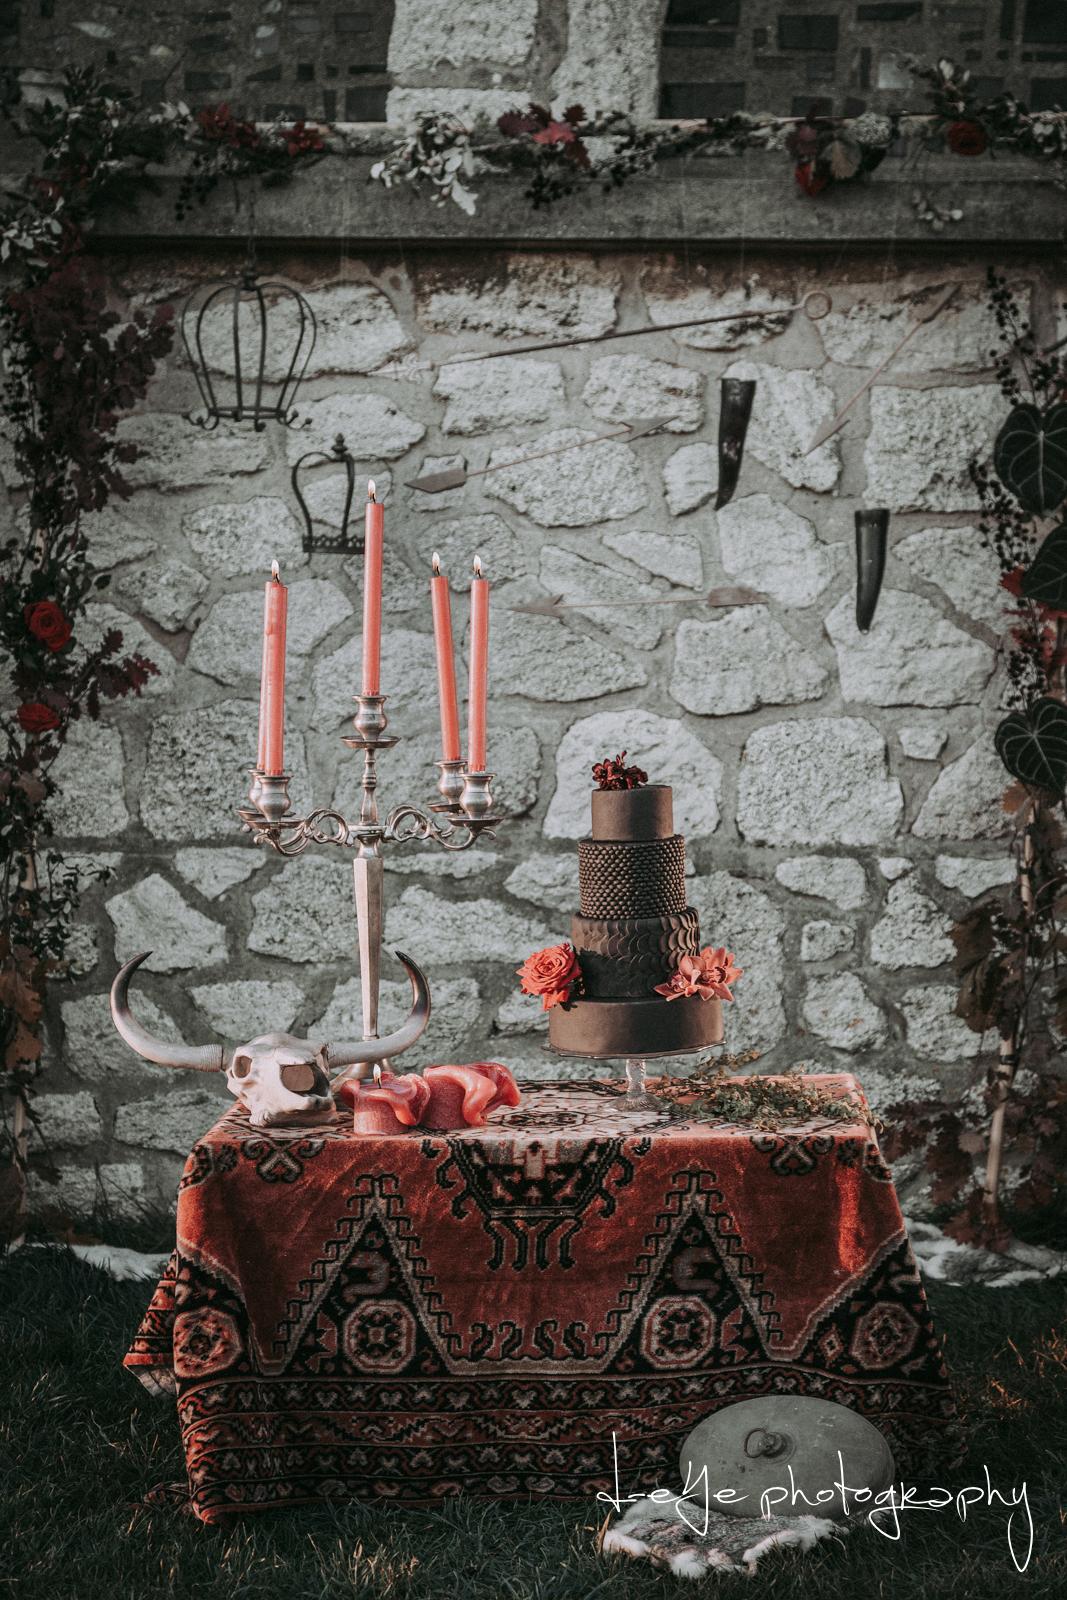 Gestylde tafel Game of Thrones shoot zwarte taart. Foto D-eYe Photography